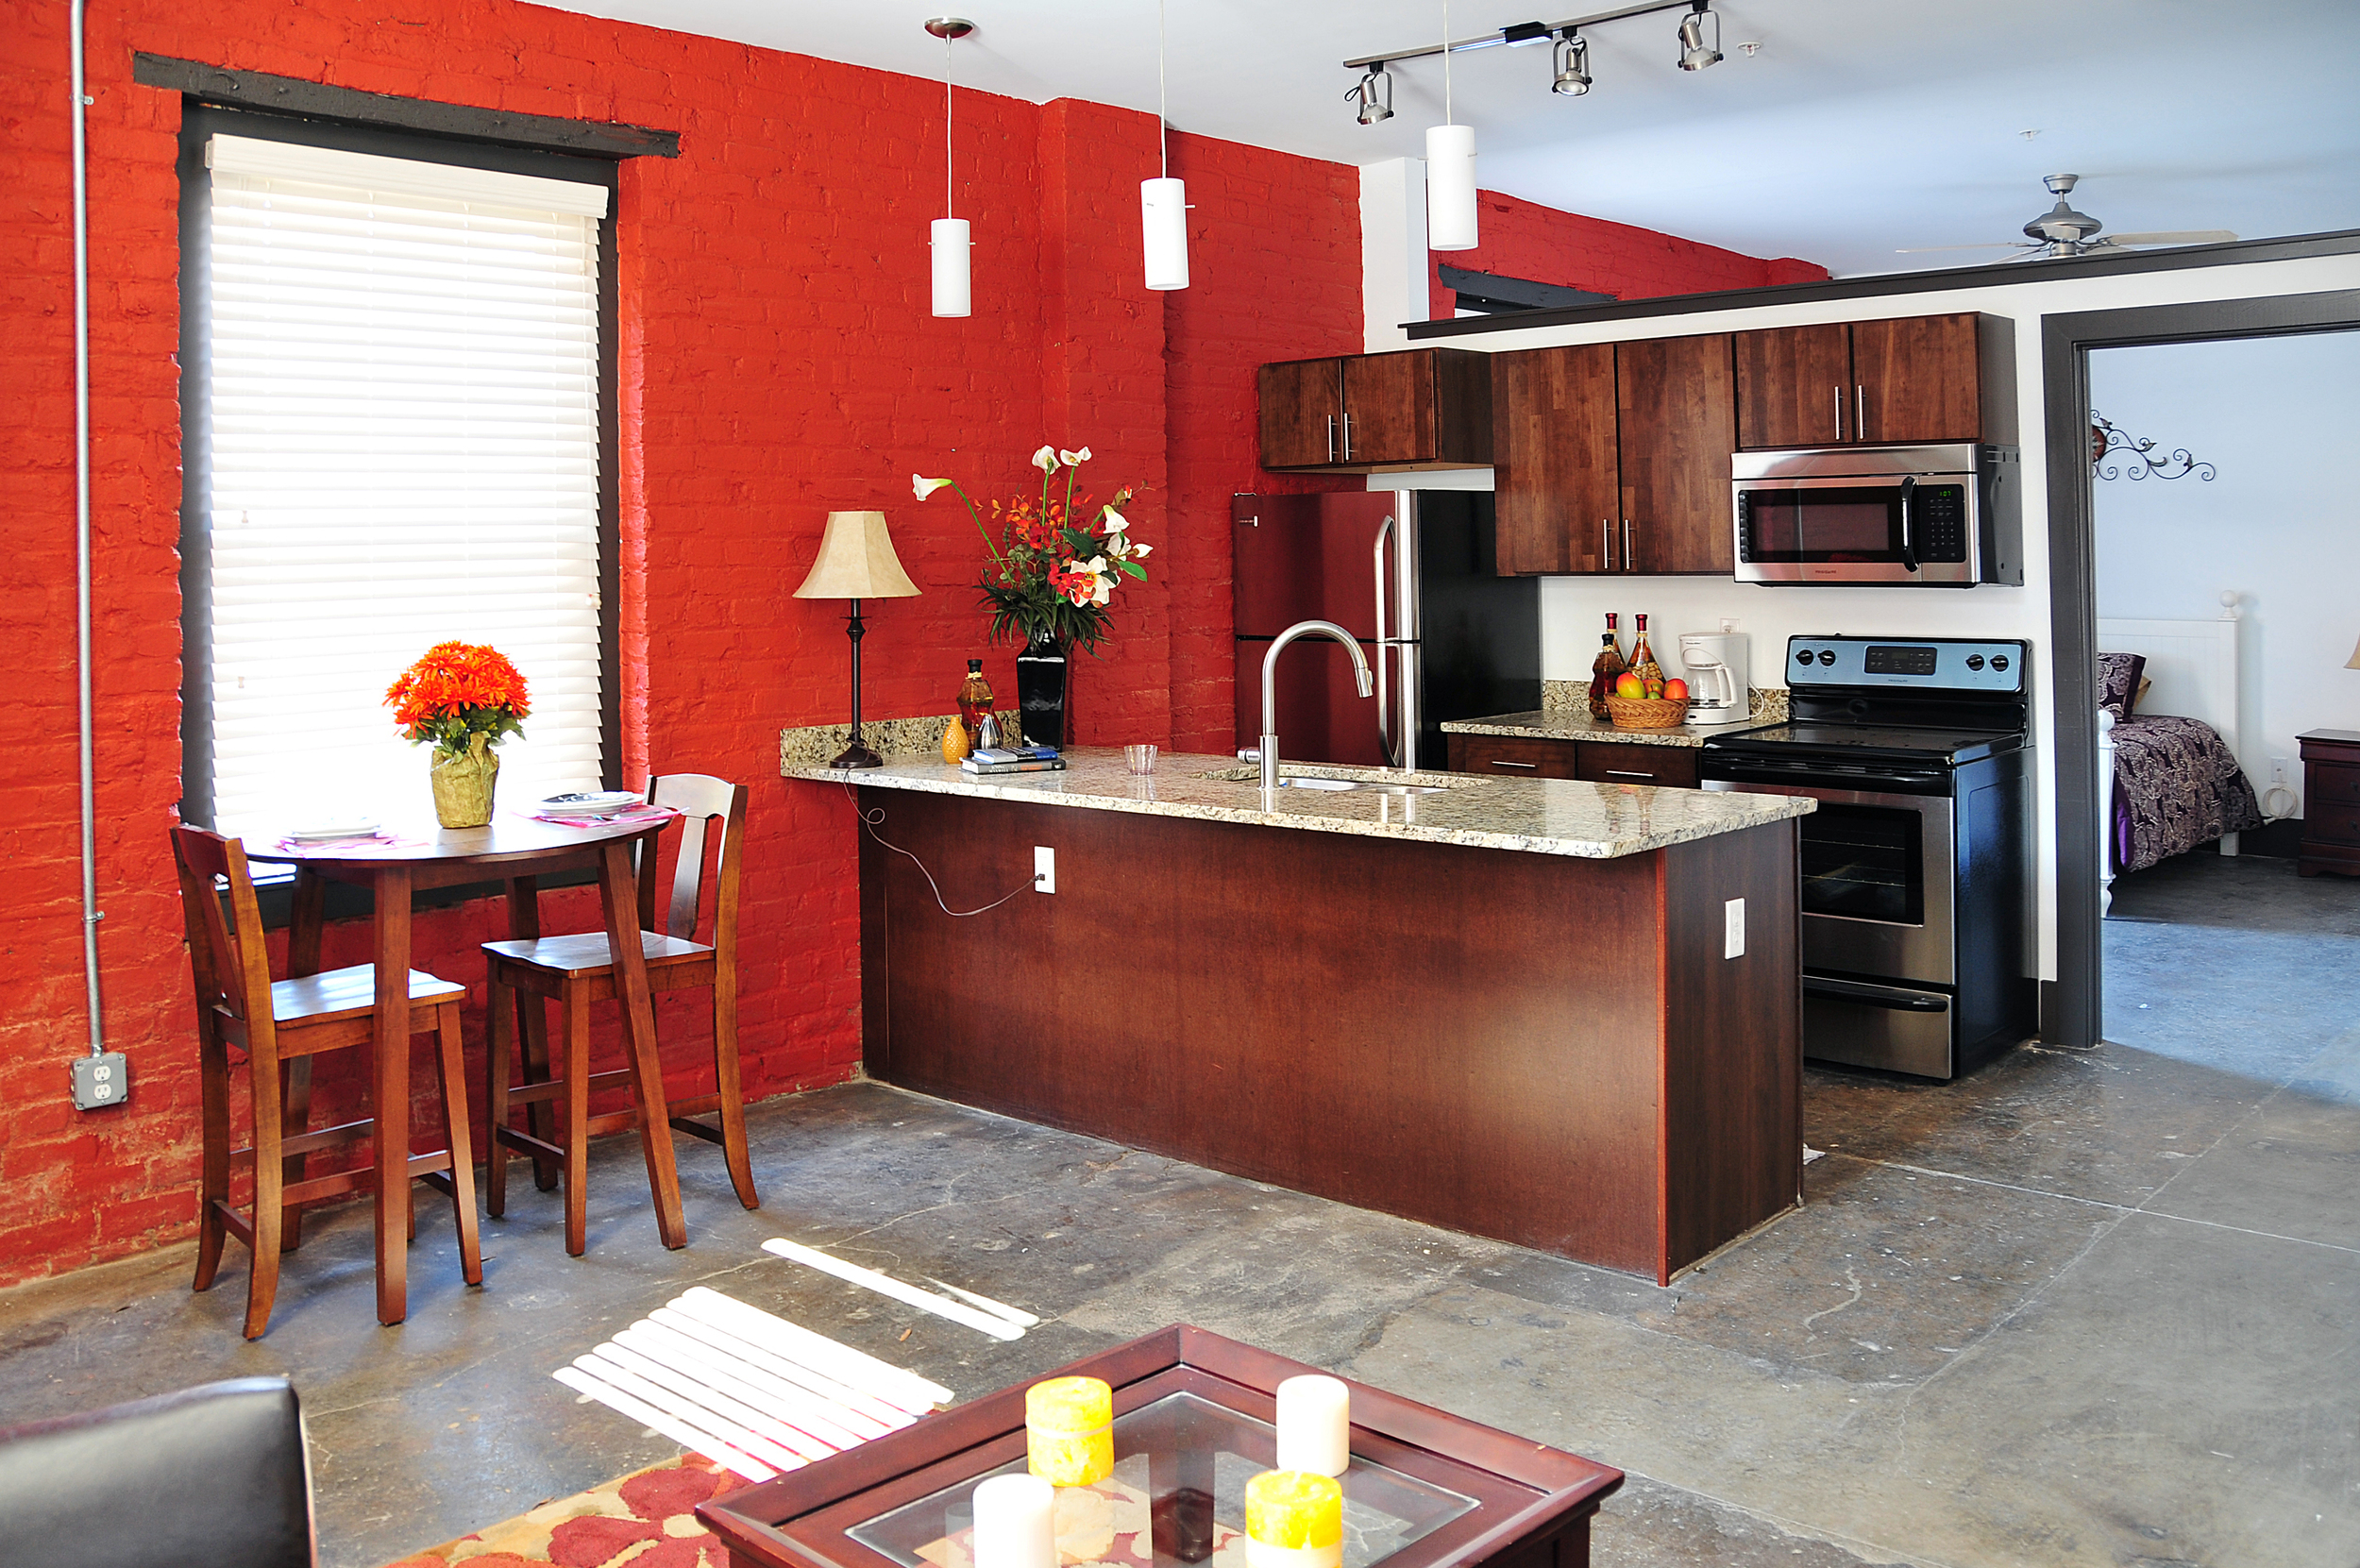 5 spot flats - kitchen